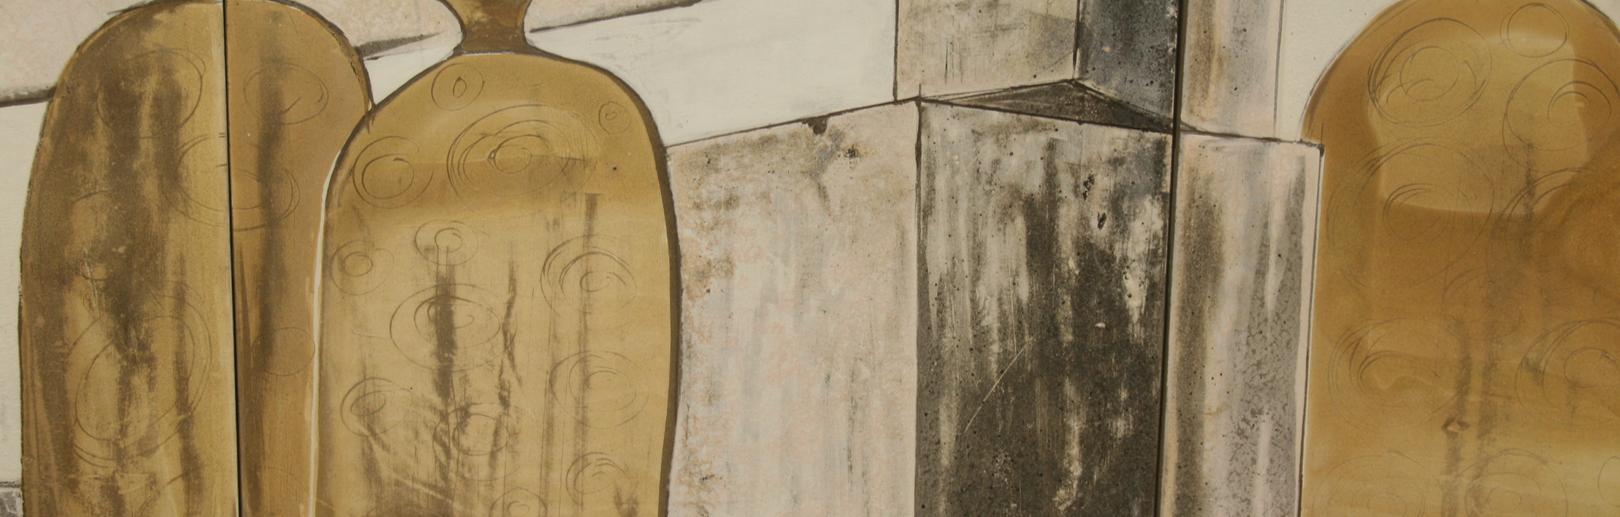 Mural cerámico